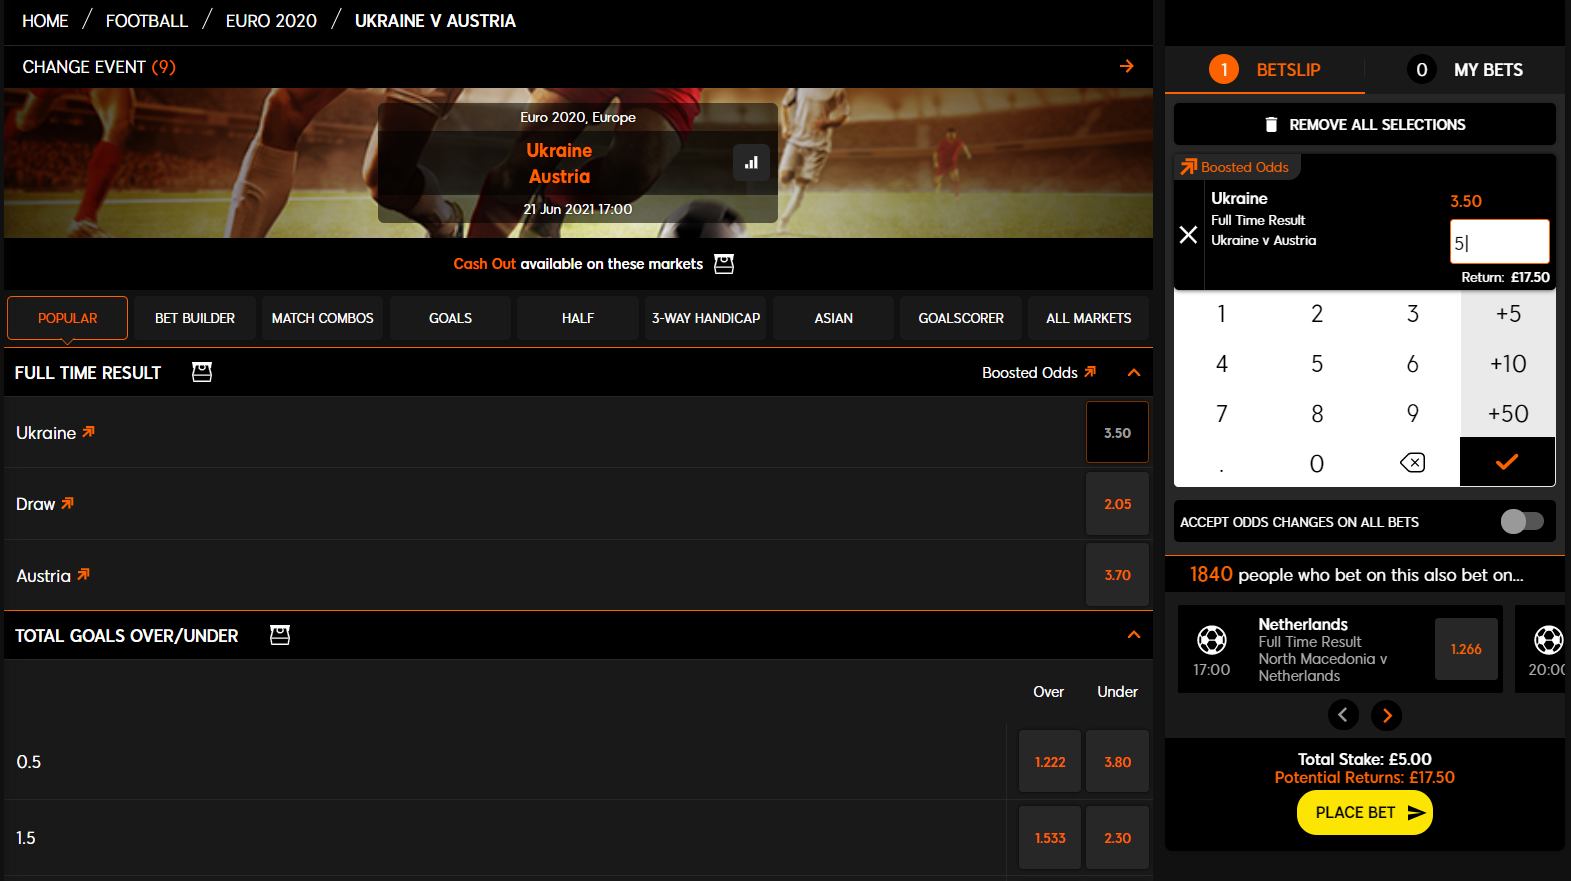 Best Ukranian betting sites - 888sport bet placement